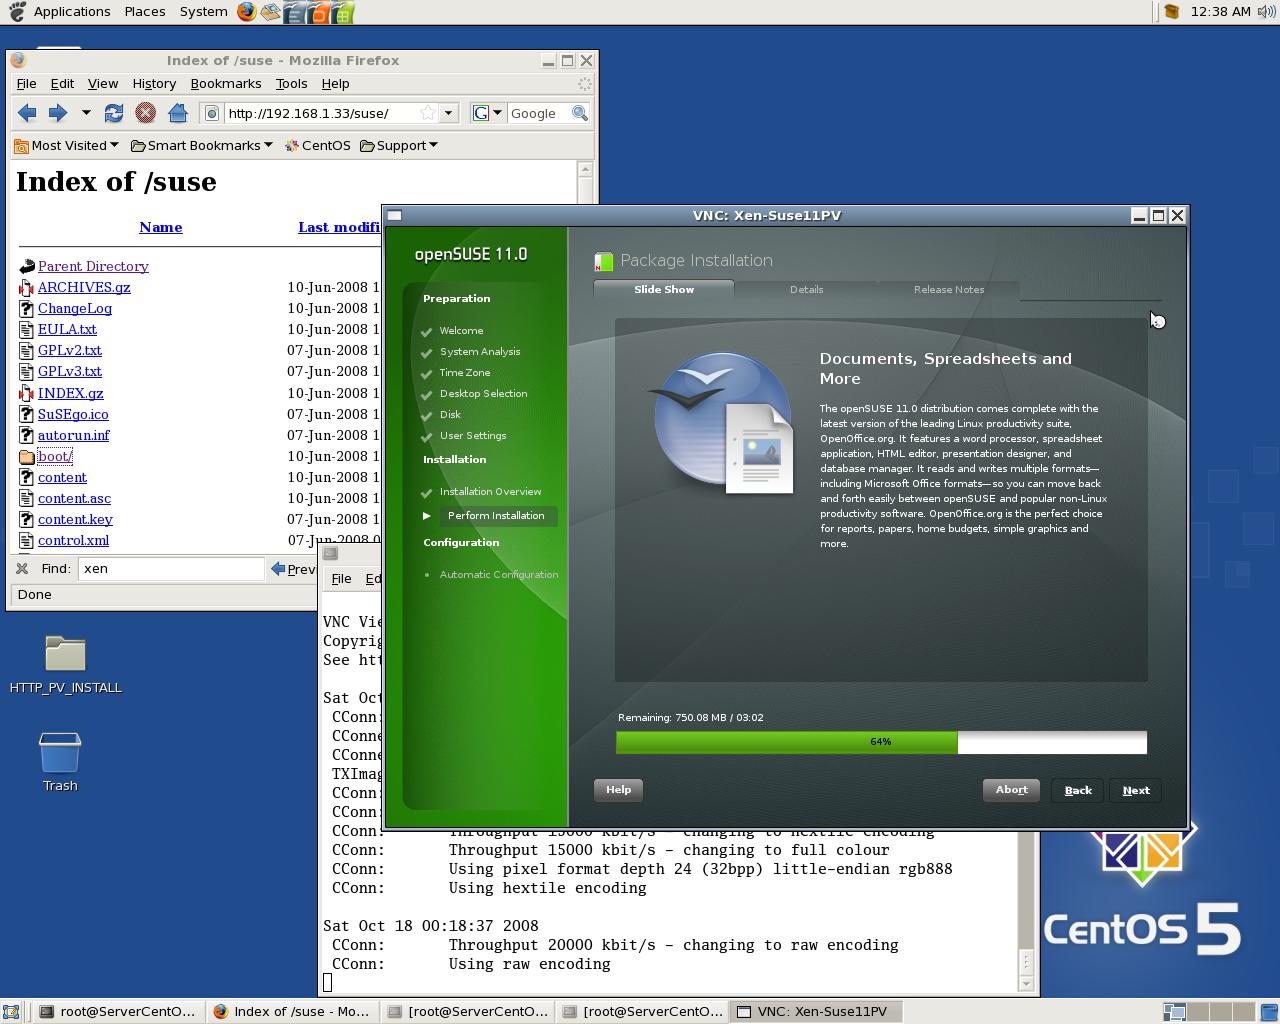 Sonicwall global vpn client macbook